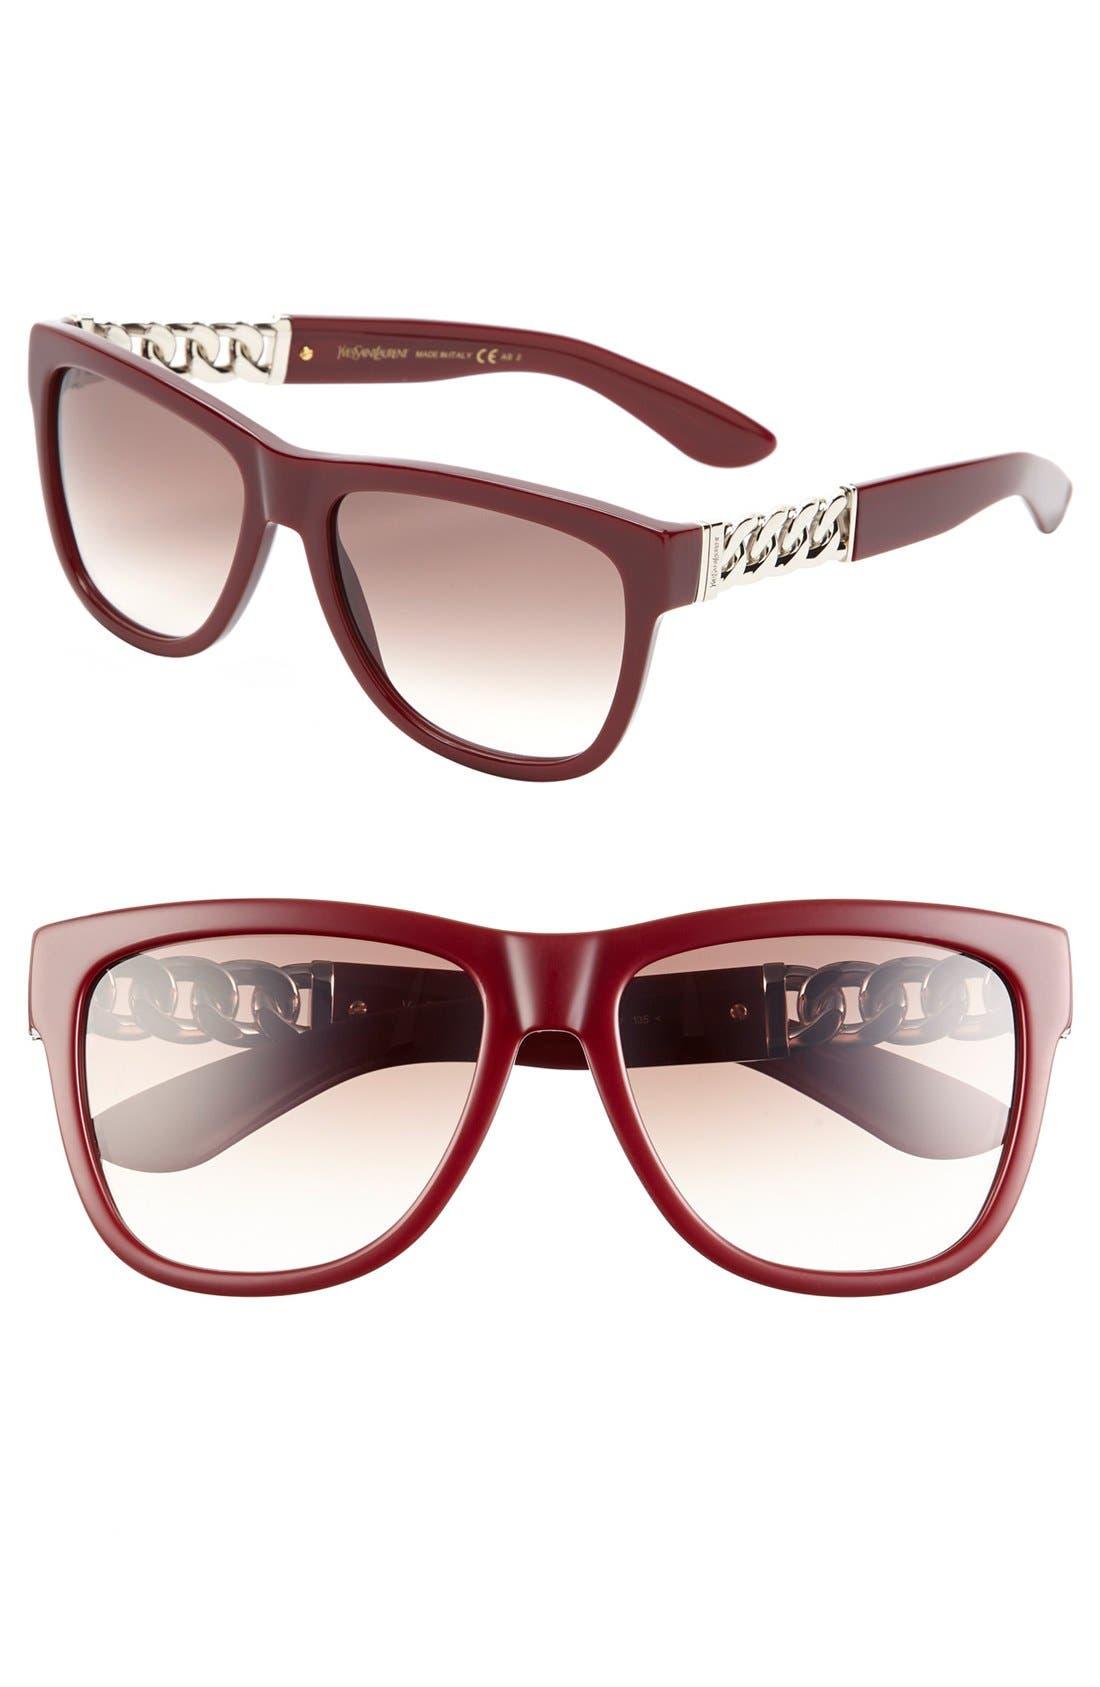 Alternate Image 1 Selected - Saint Laurent 56mm Oversized Sunglasses